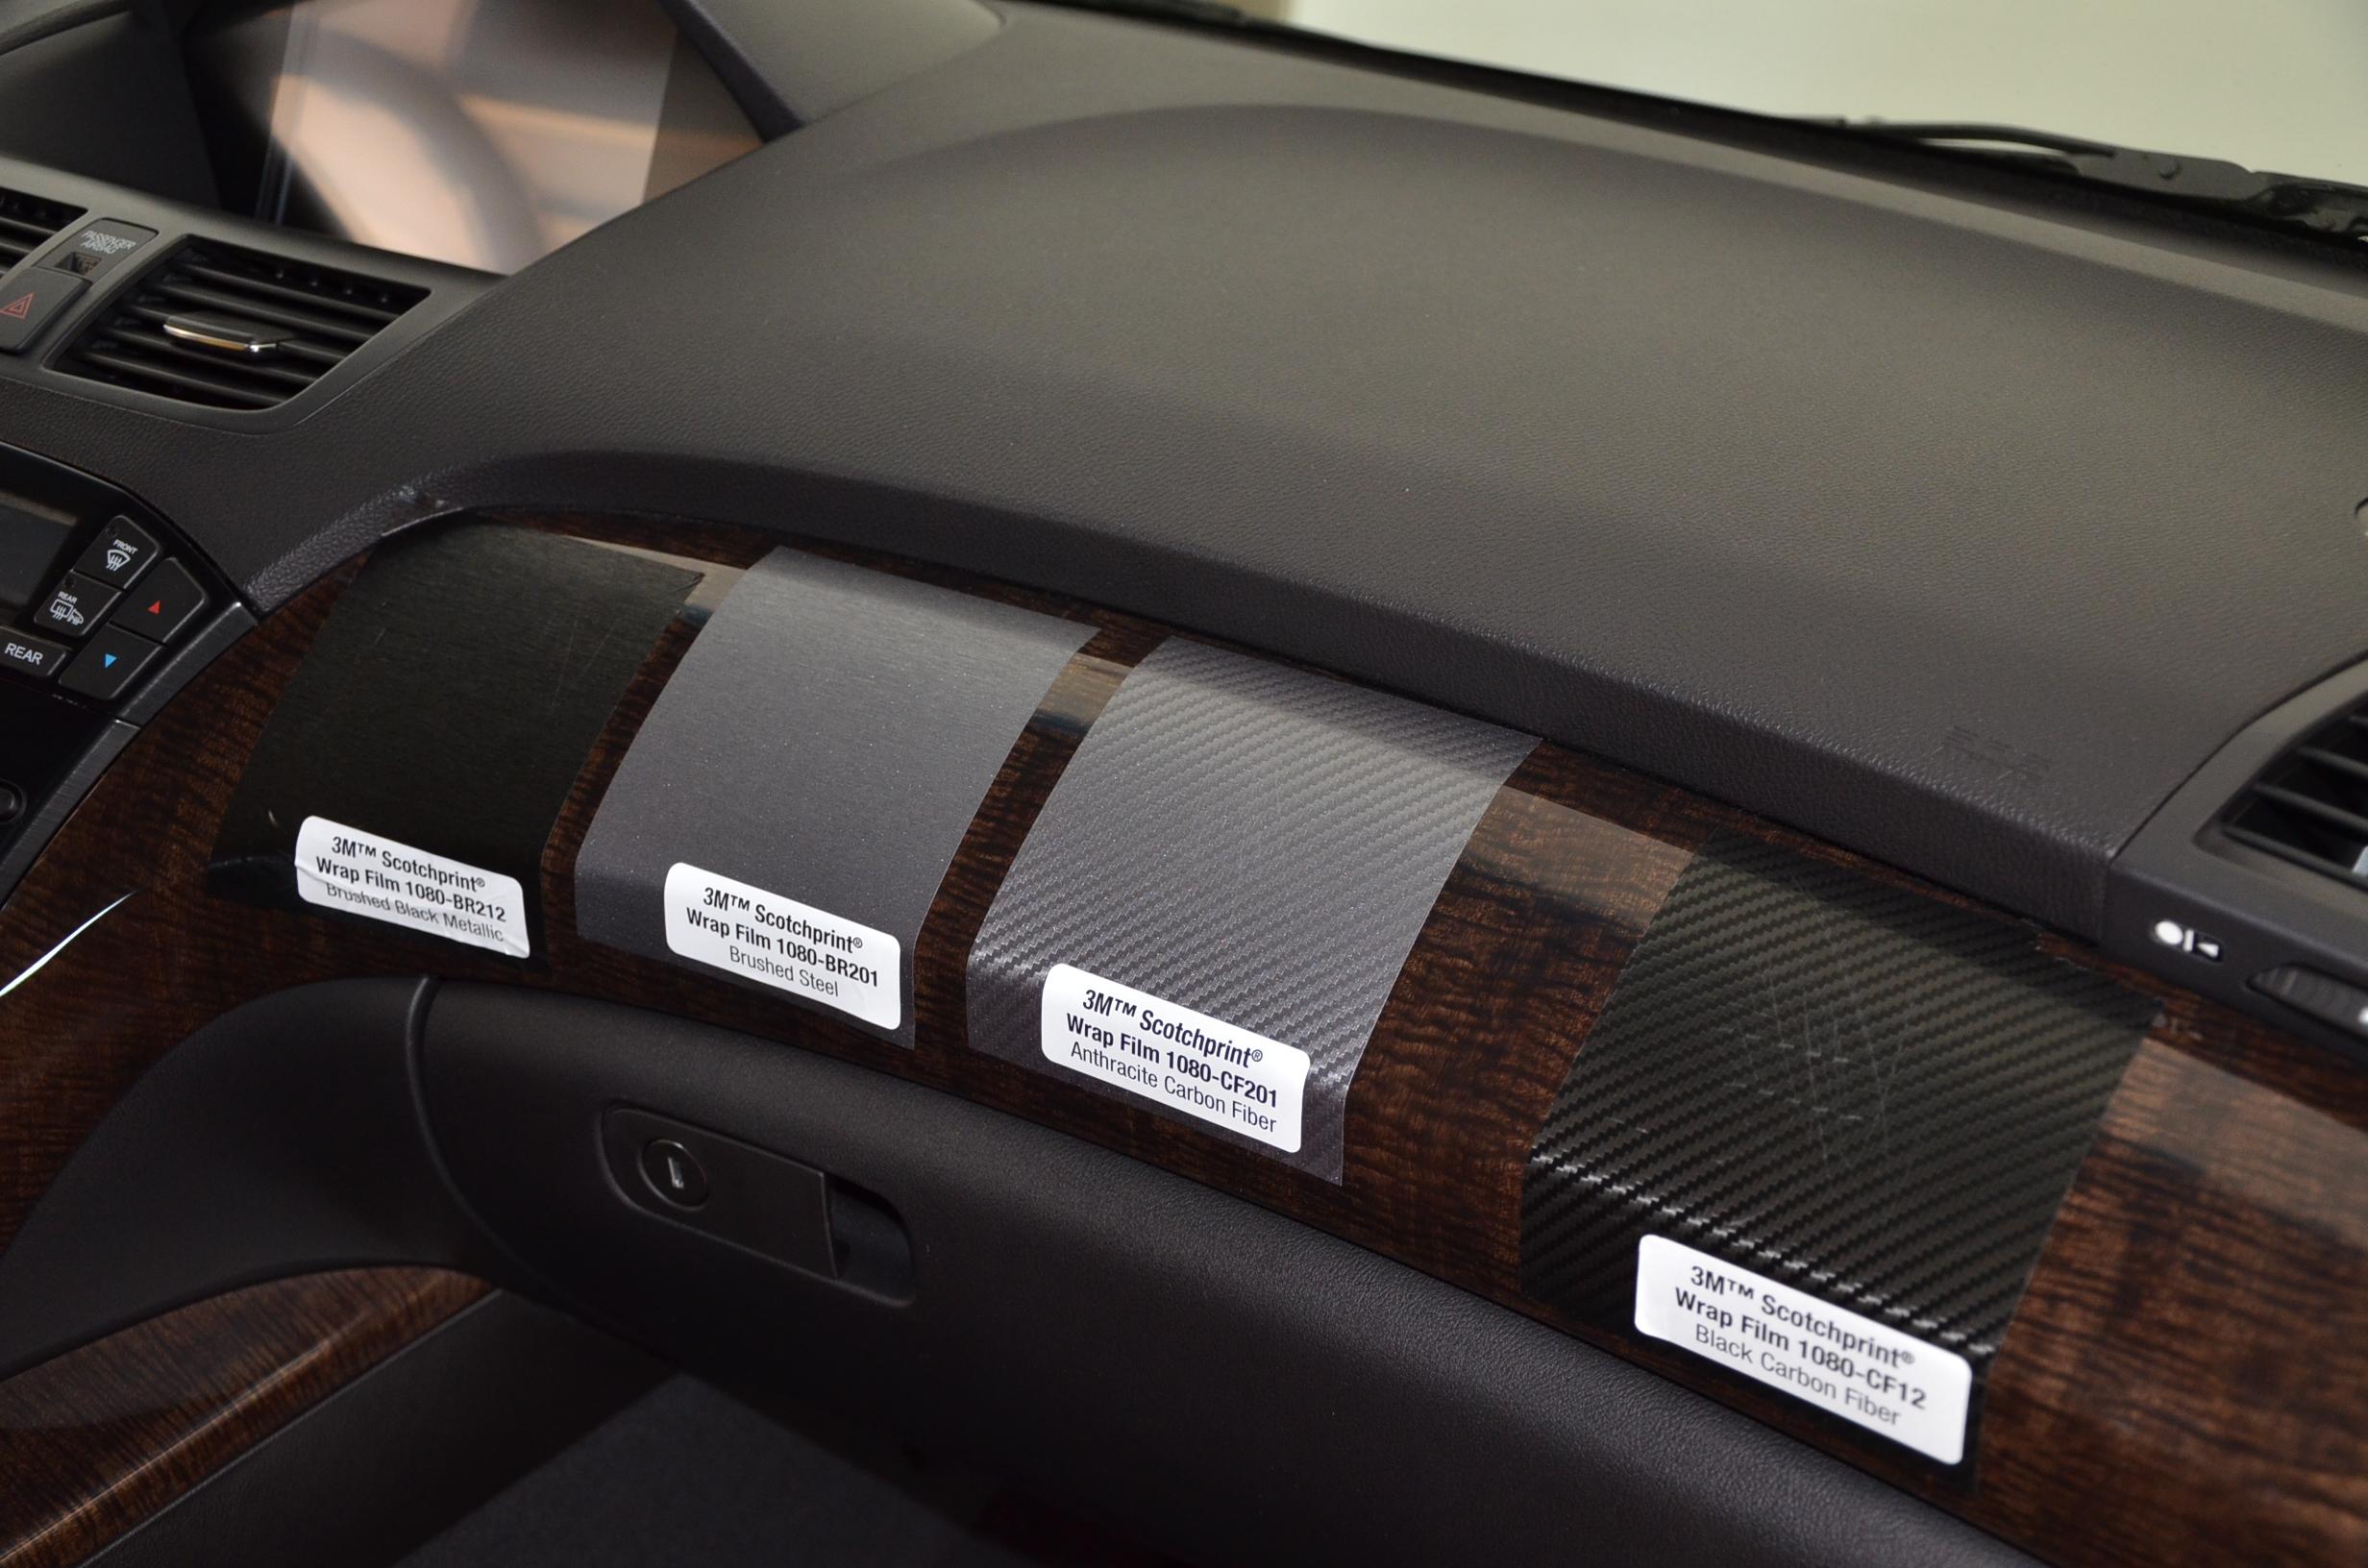 Acura Mdx Interior >> Received 3M Wrap Film 1080 samples - Acura MDX Forum : Acura MDX SUV Forums